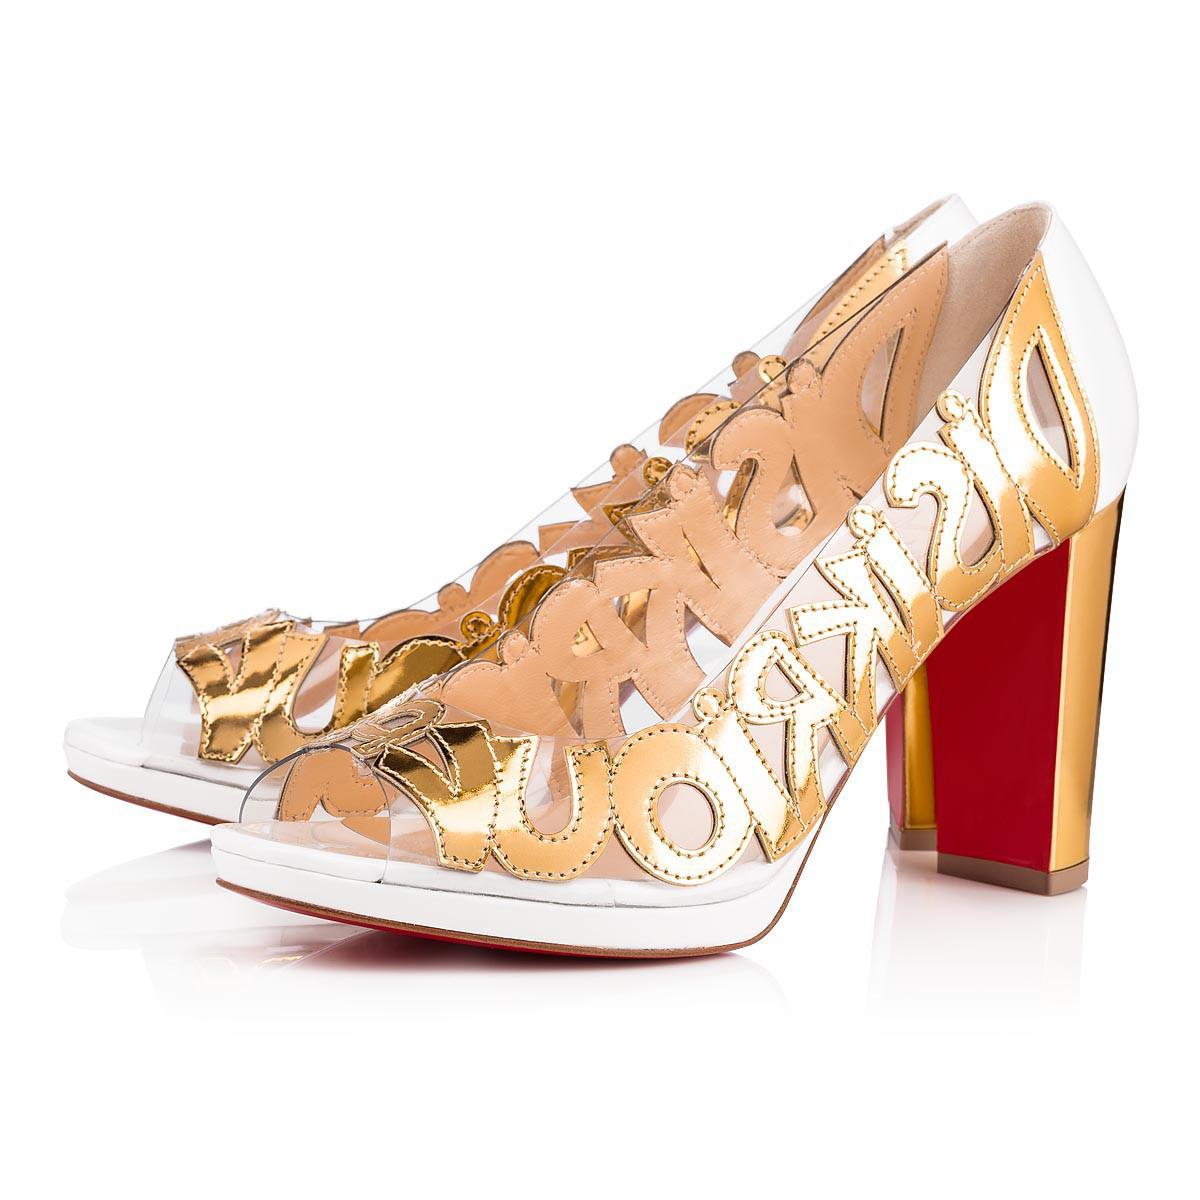 ddcfef9304280 Christian Louboutin. Women s Metallic We Know Specchio pvc 100 Version Gold  Specchio laminato